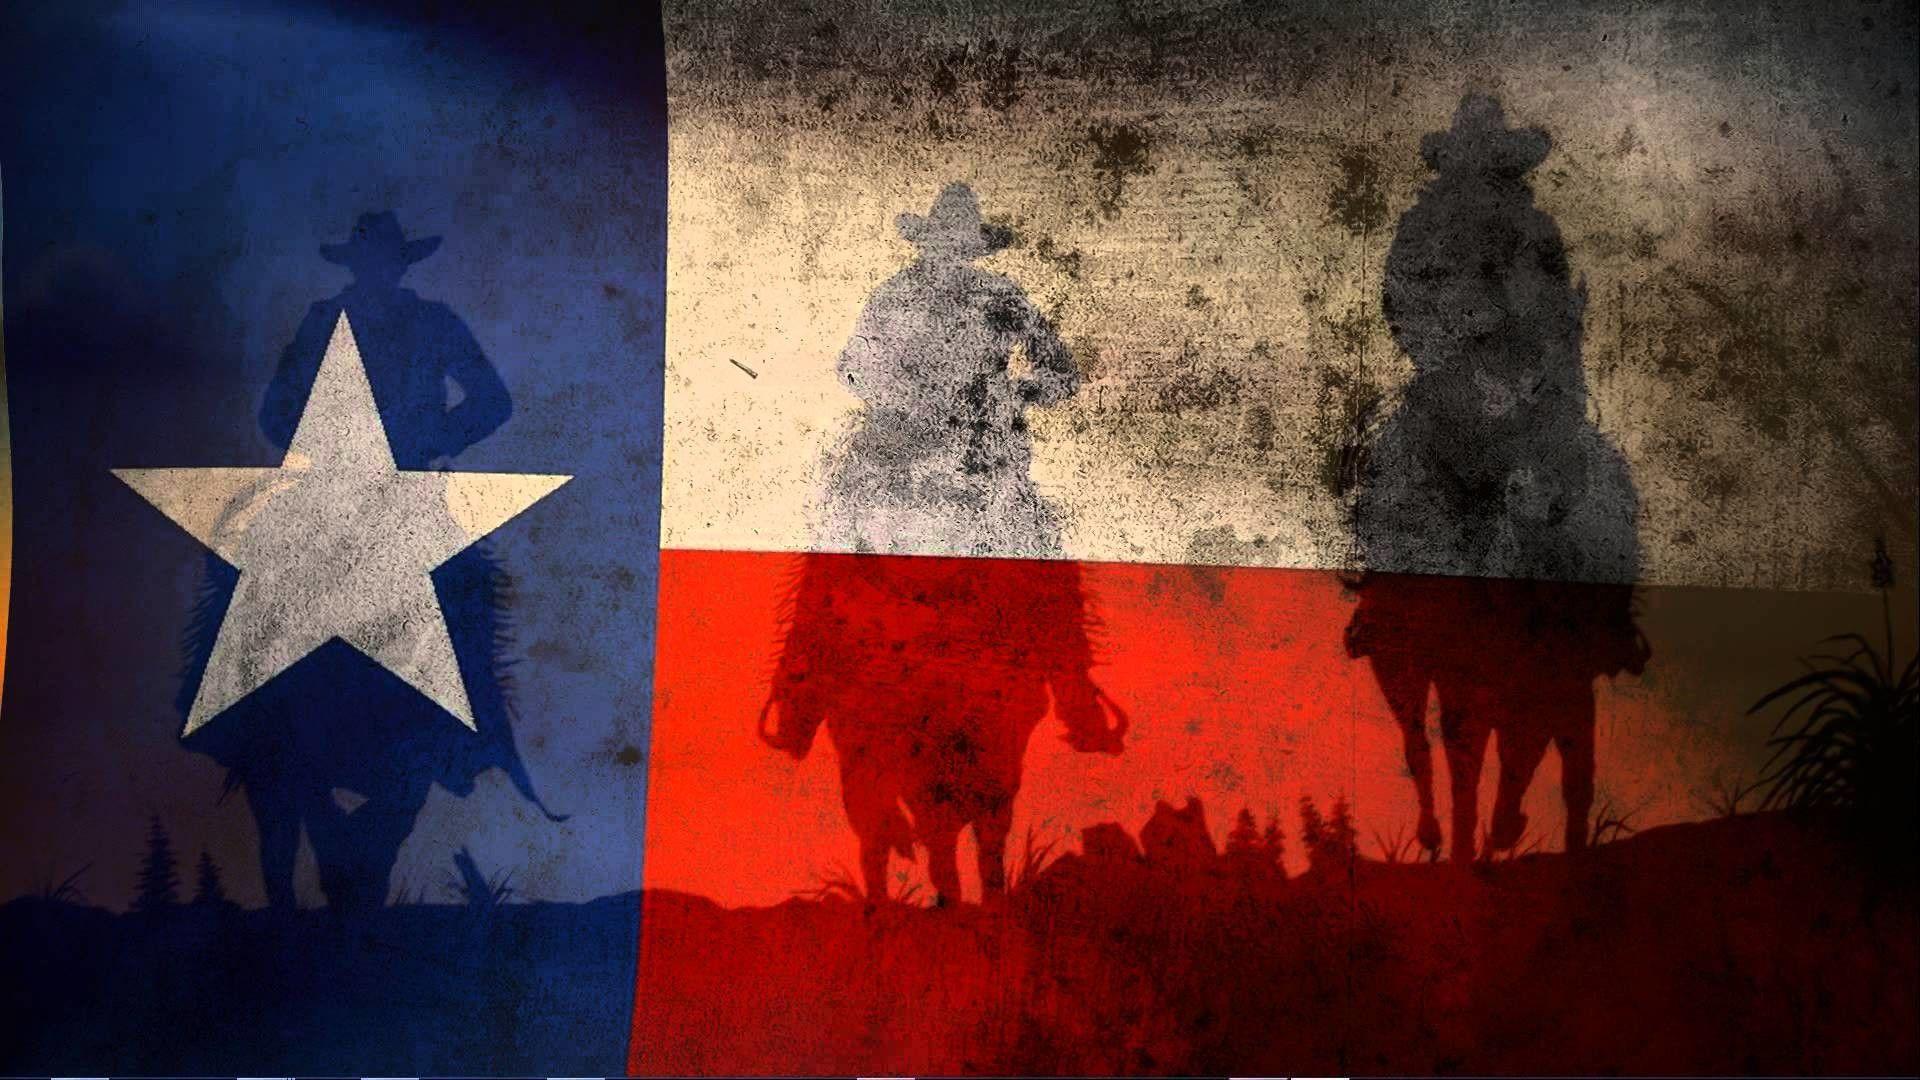 wallpaper texas, texas desktop wallpaper